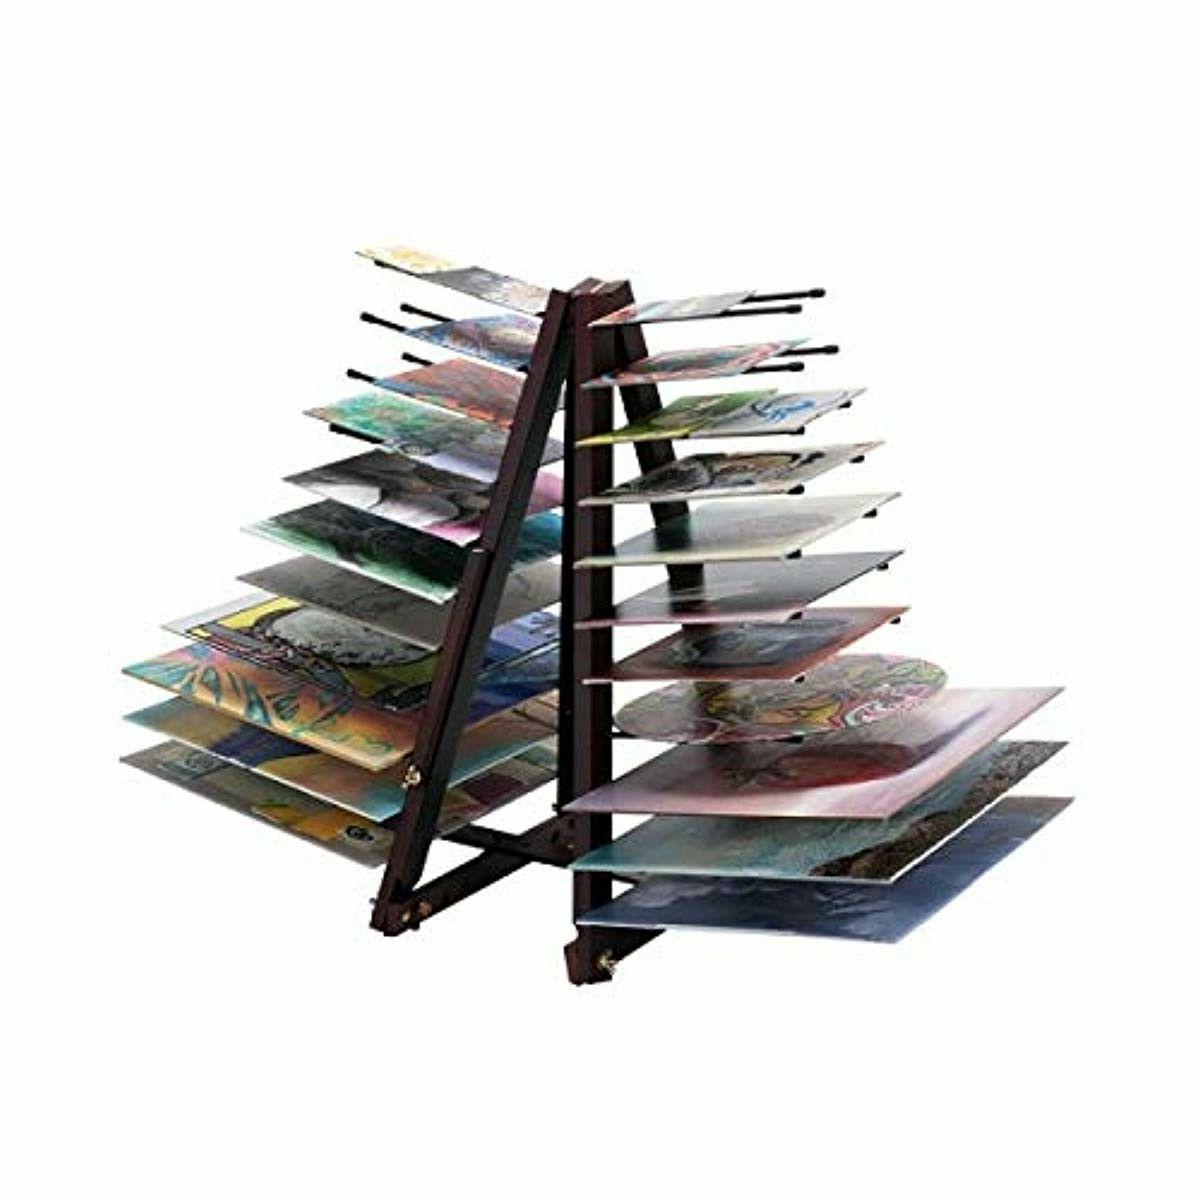 Creative Art Drying Rack For Artist Prints